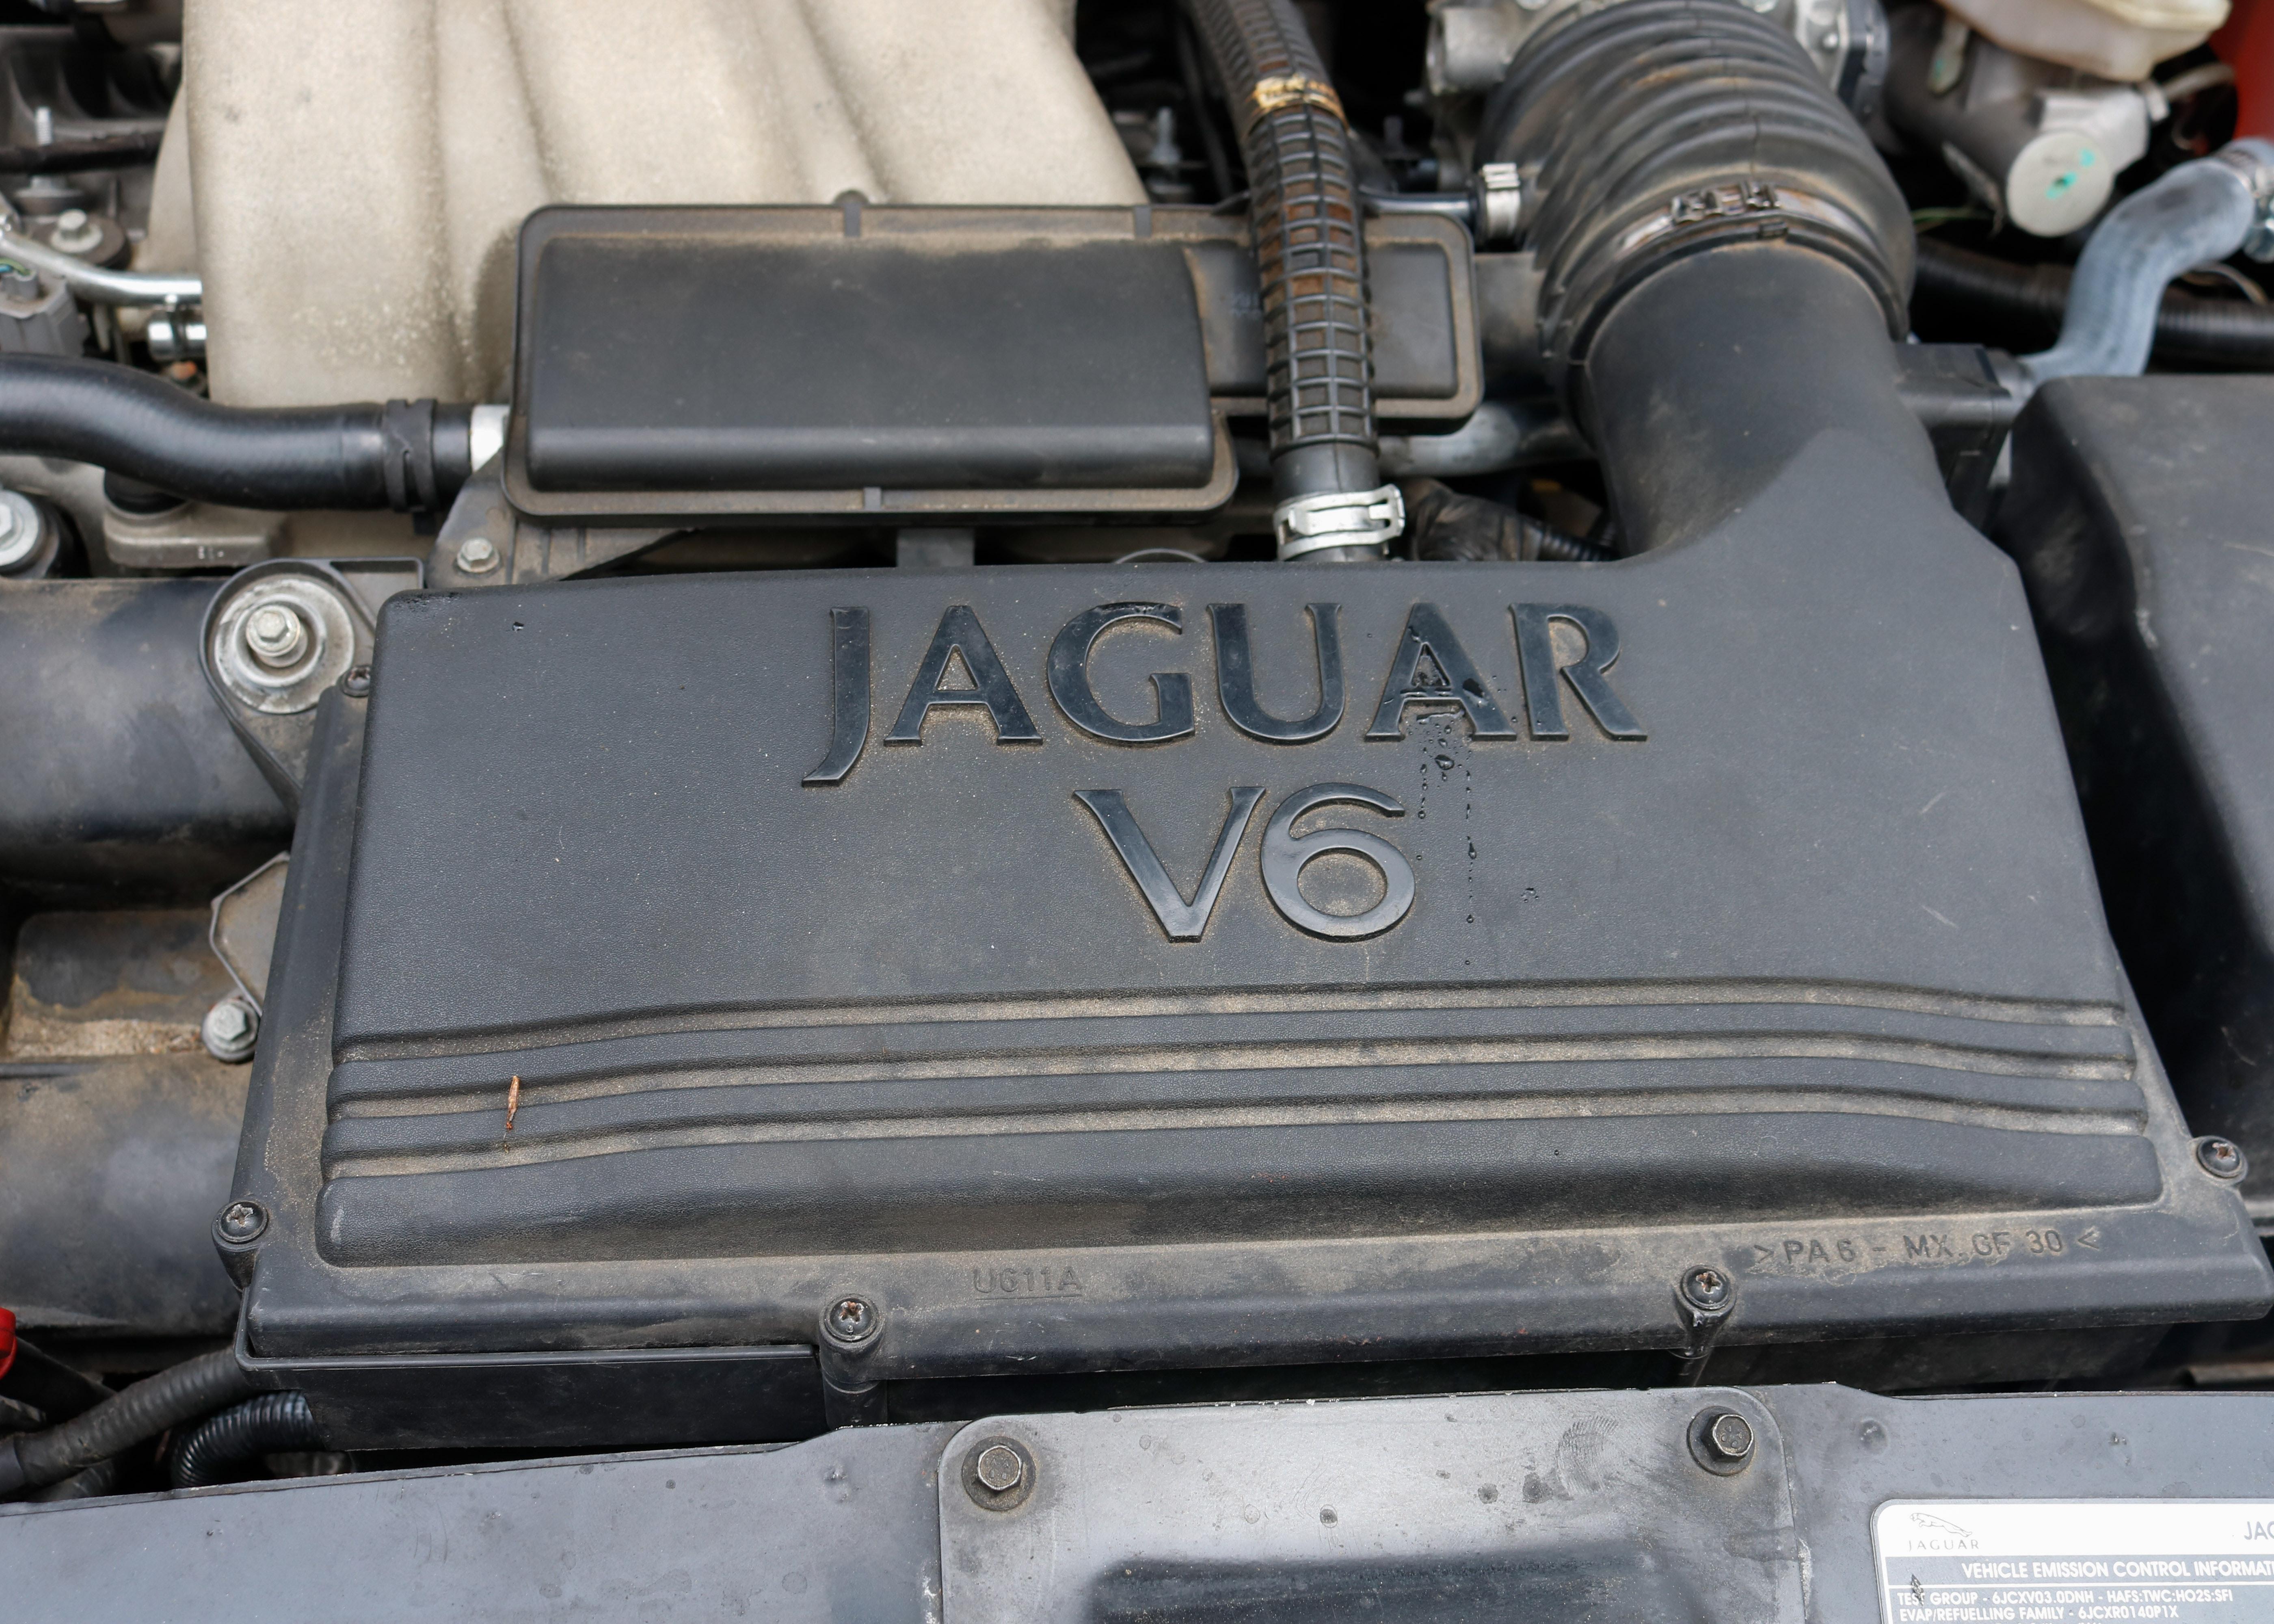 2006 Jaguar Xtype Station Wagon Ebth